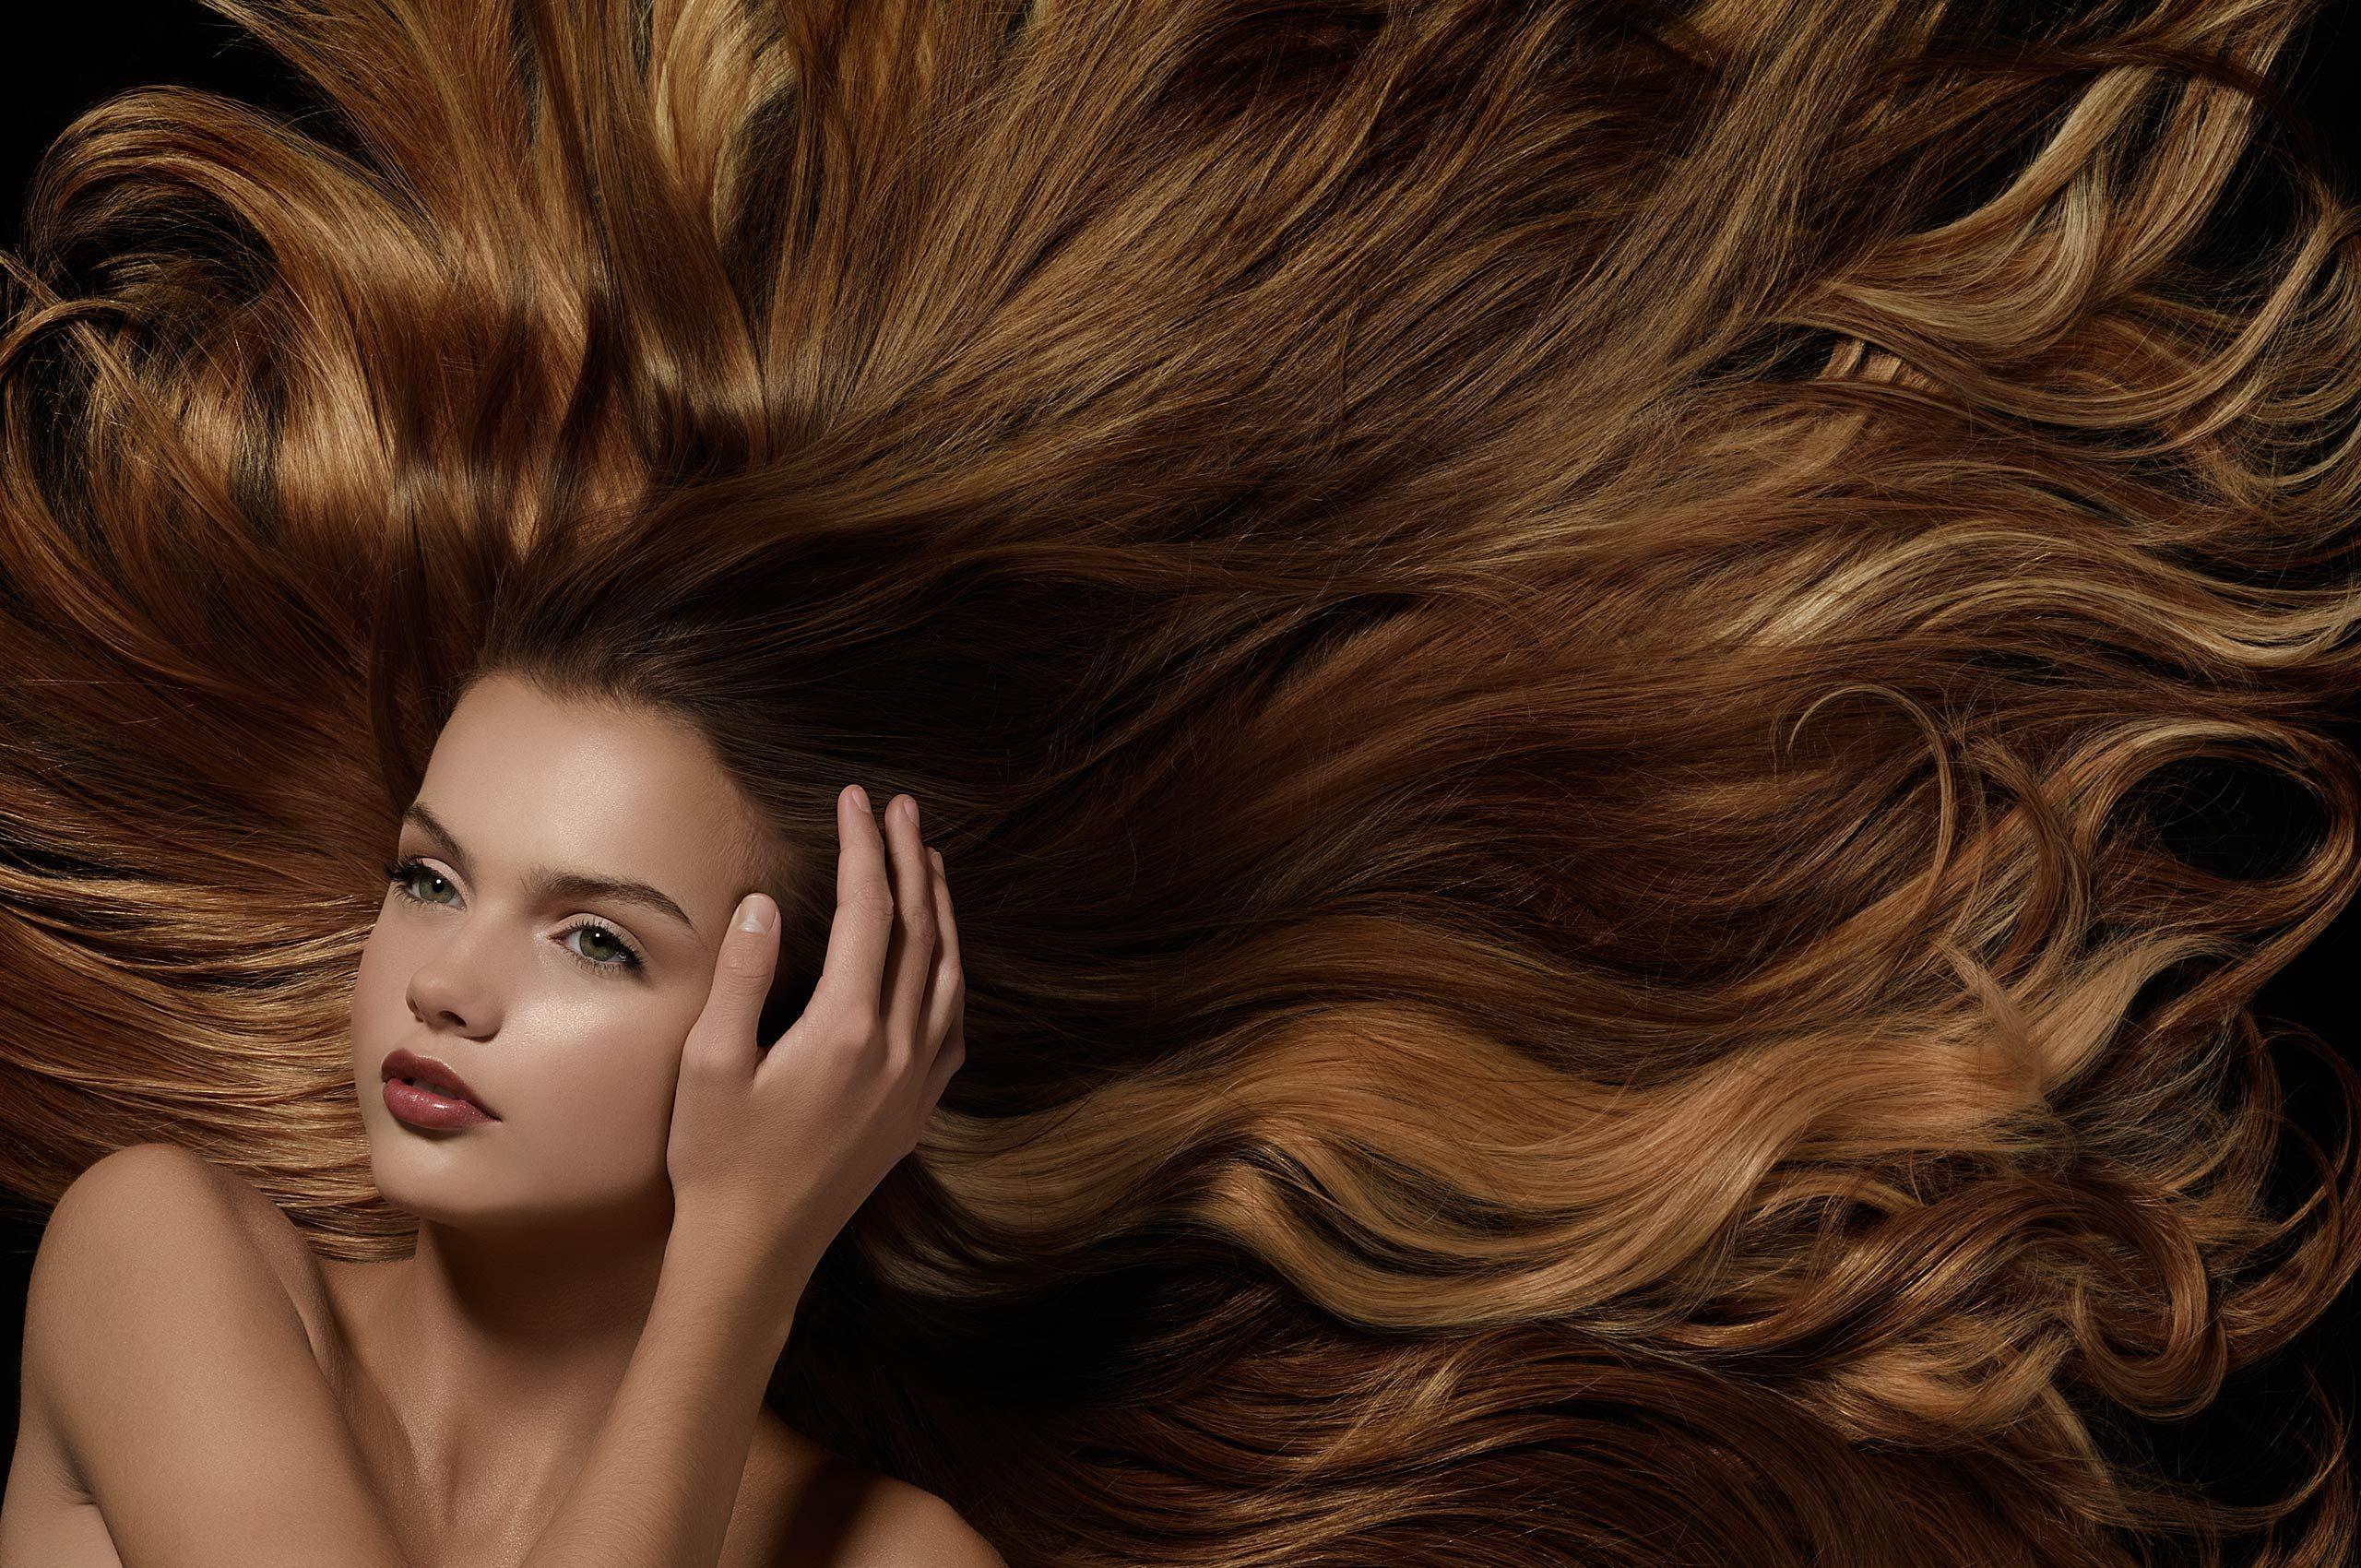 Beauty_Micah_Fidler_Horizontal_002.jpg